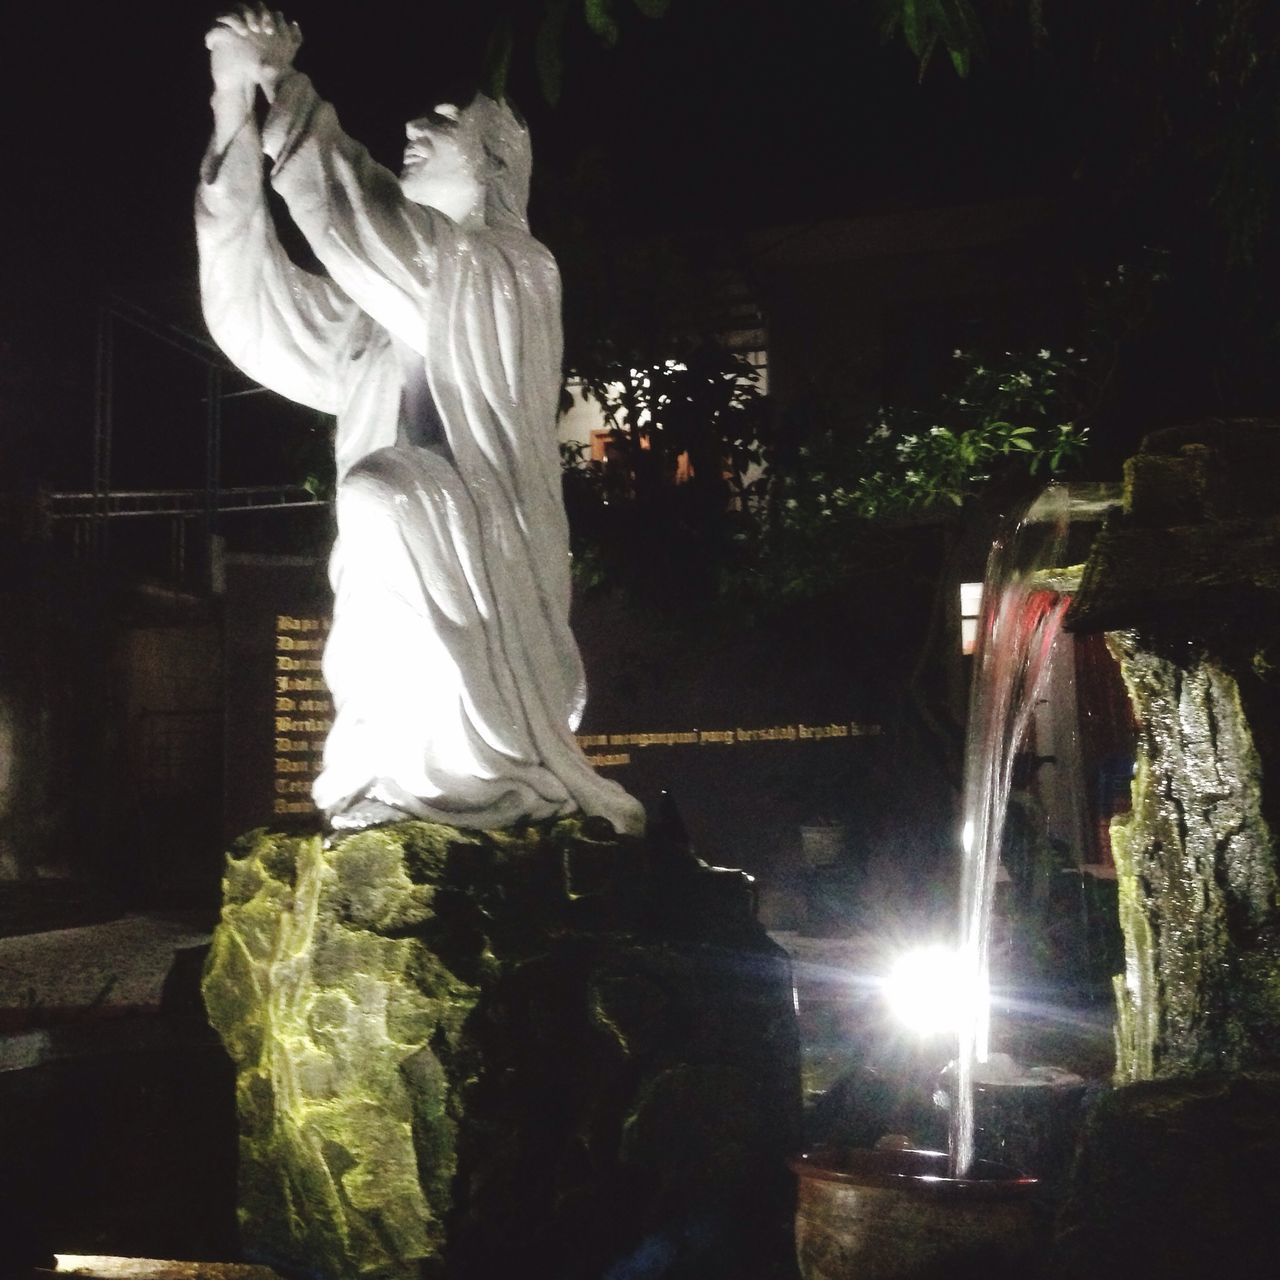 Jesus Jesus Christ Praying Statue Solo Jawatengah Pray IPhone IPhoneography INDONESIA